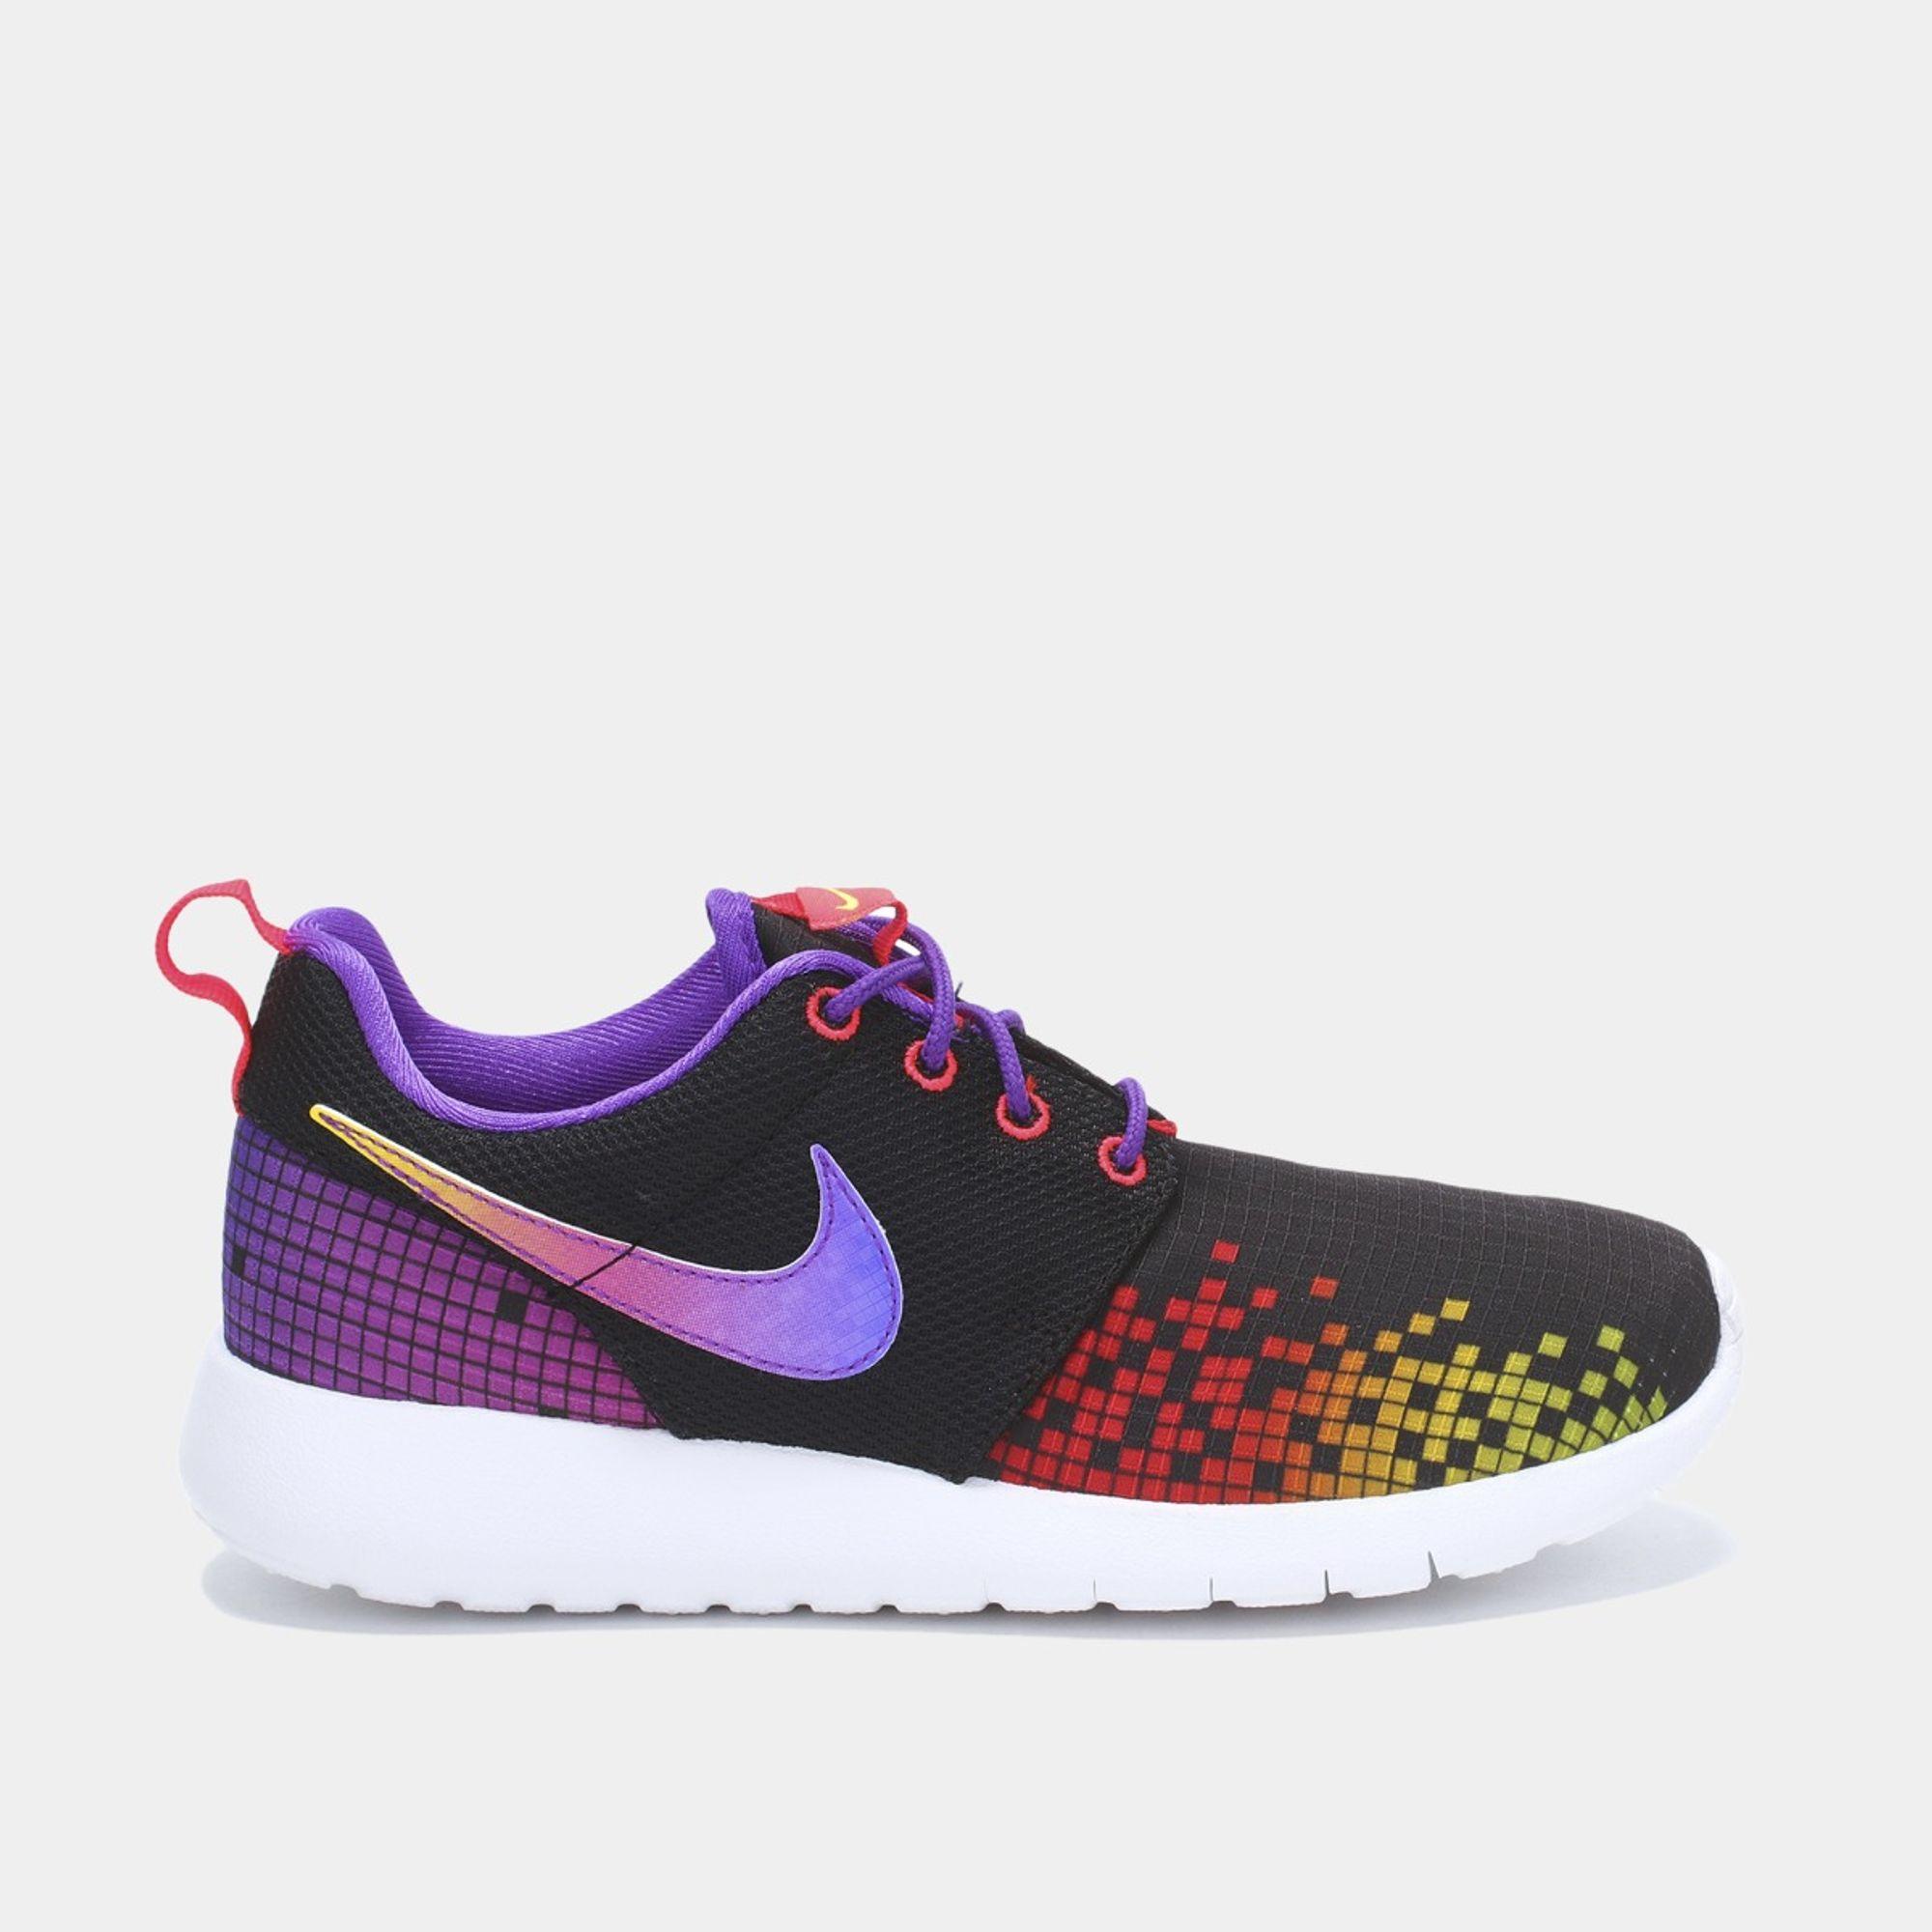 separation shoes 5b0eb 94536 Shop Black Nike Roshe One Print (Grade School) Shoe for Kids ...